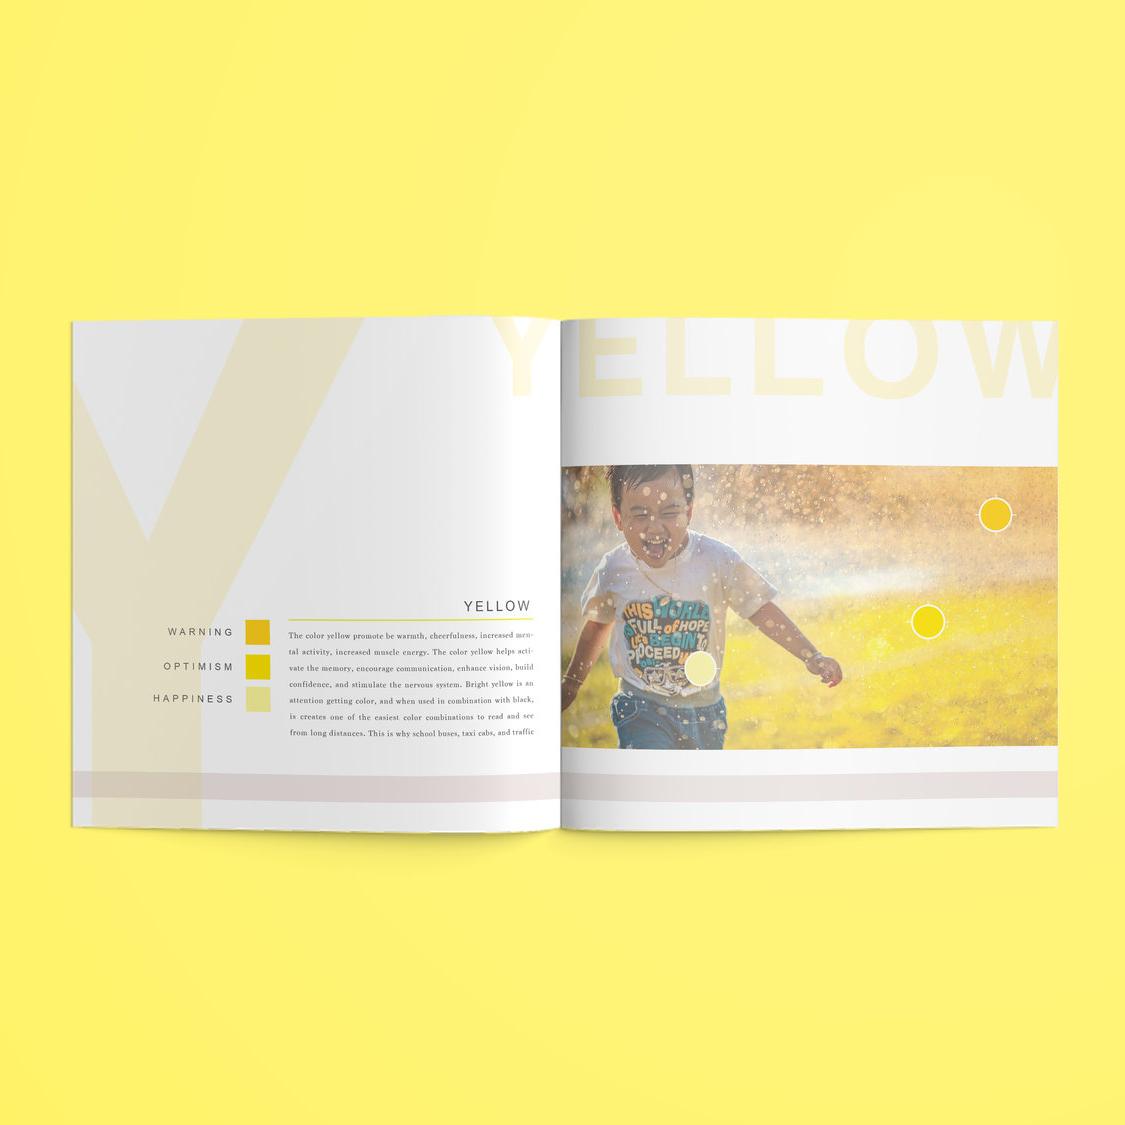 yellowmock_heather-Avery.jpg